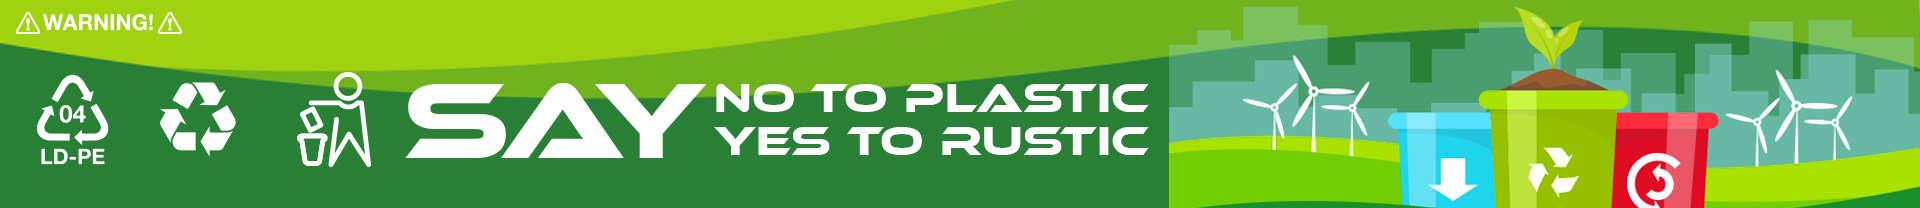 Plastics _UpdateNews360.com